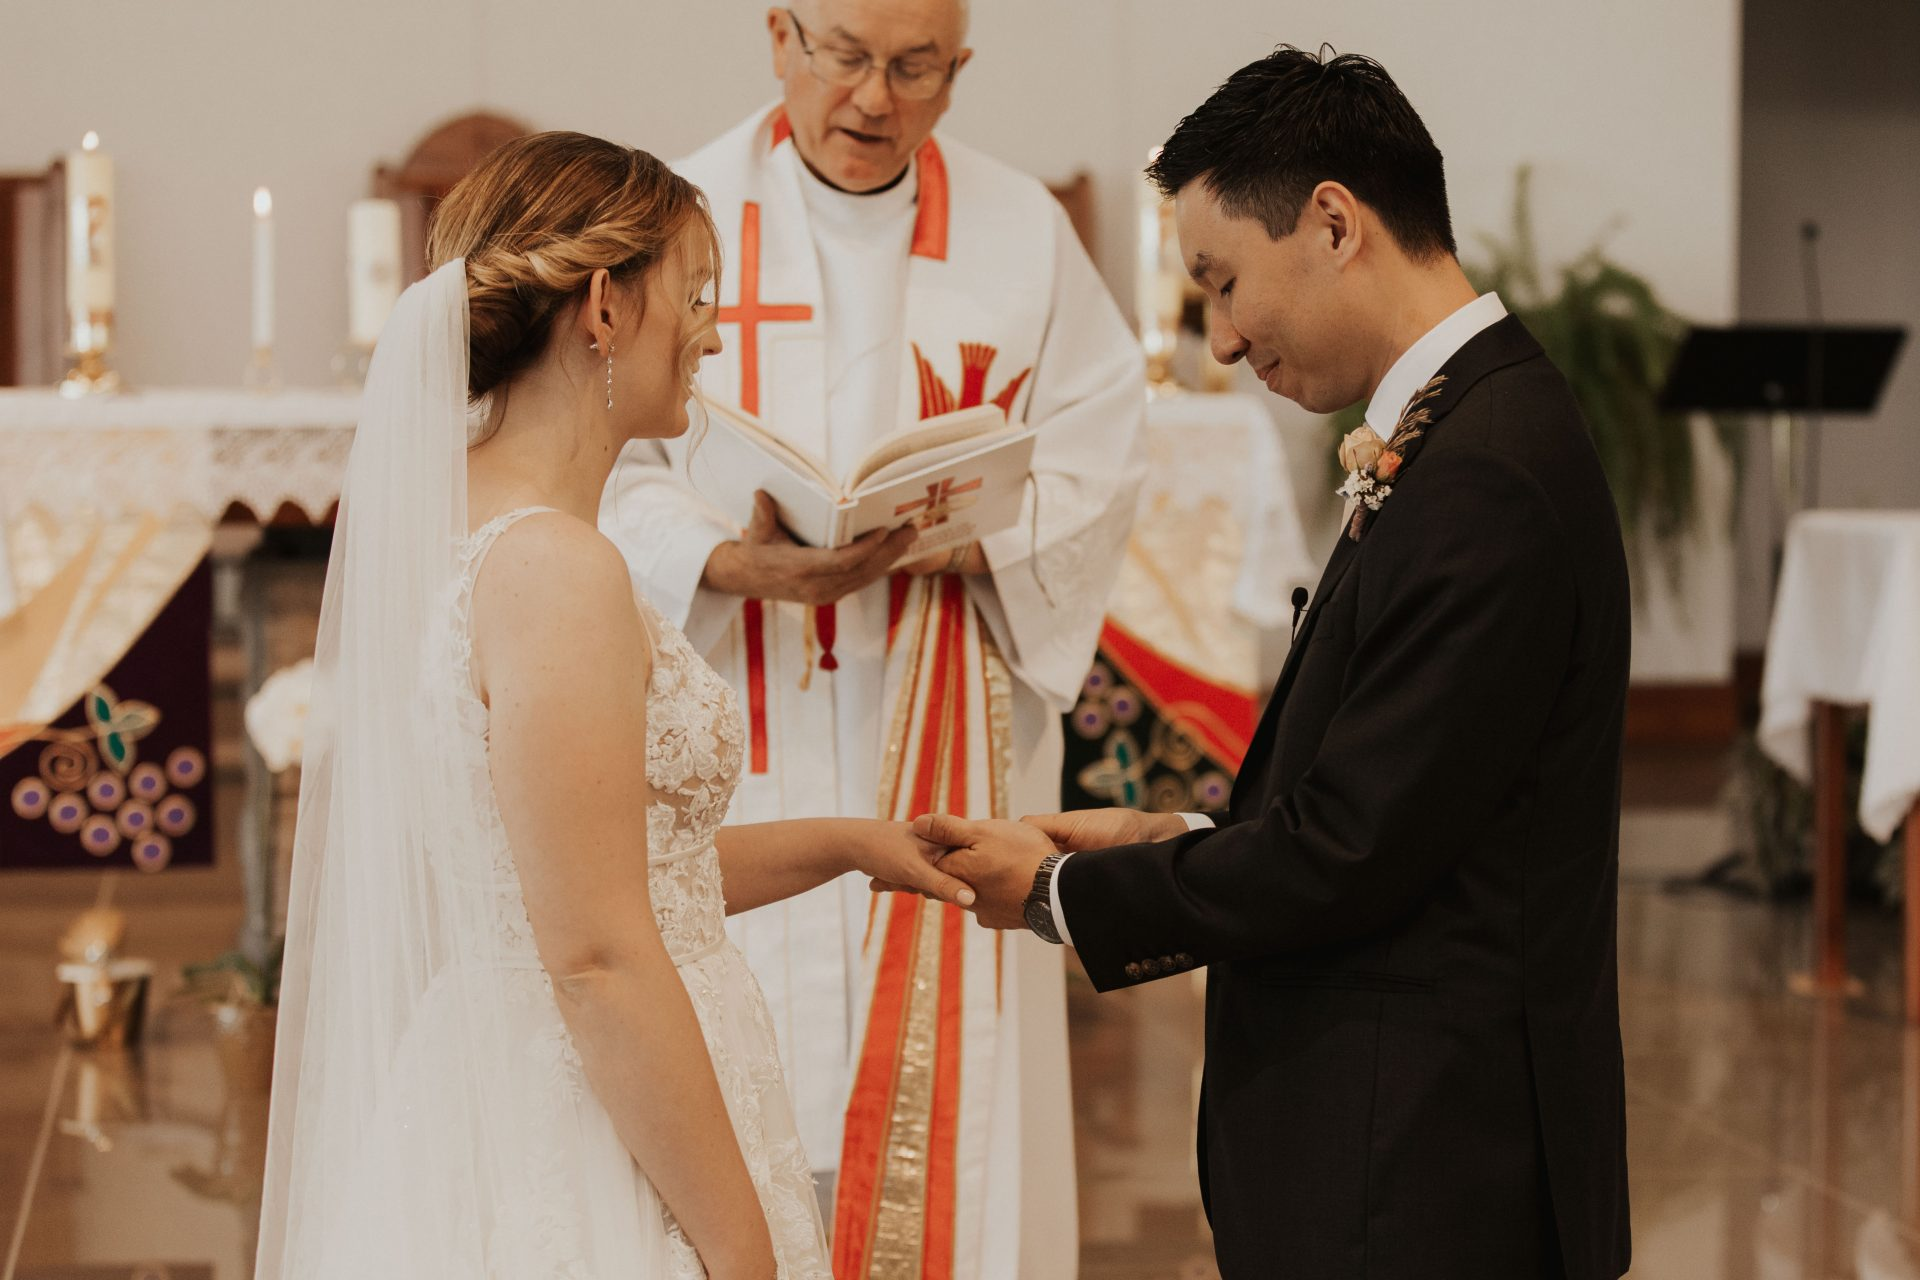 Holy Spirit parish barrie wedding photos